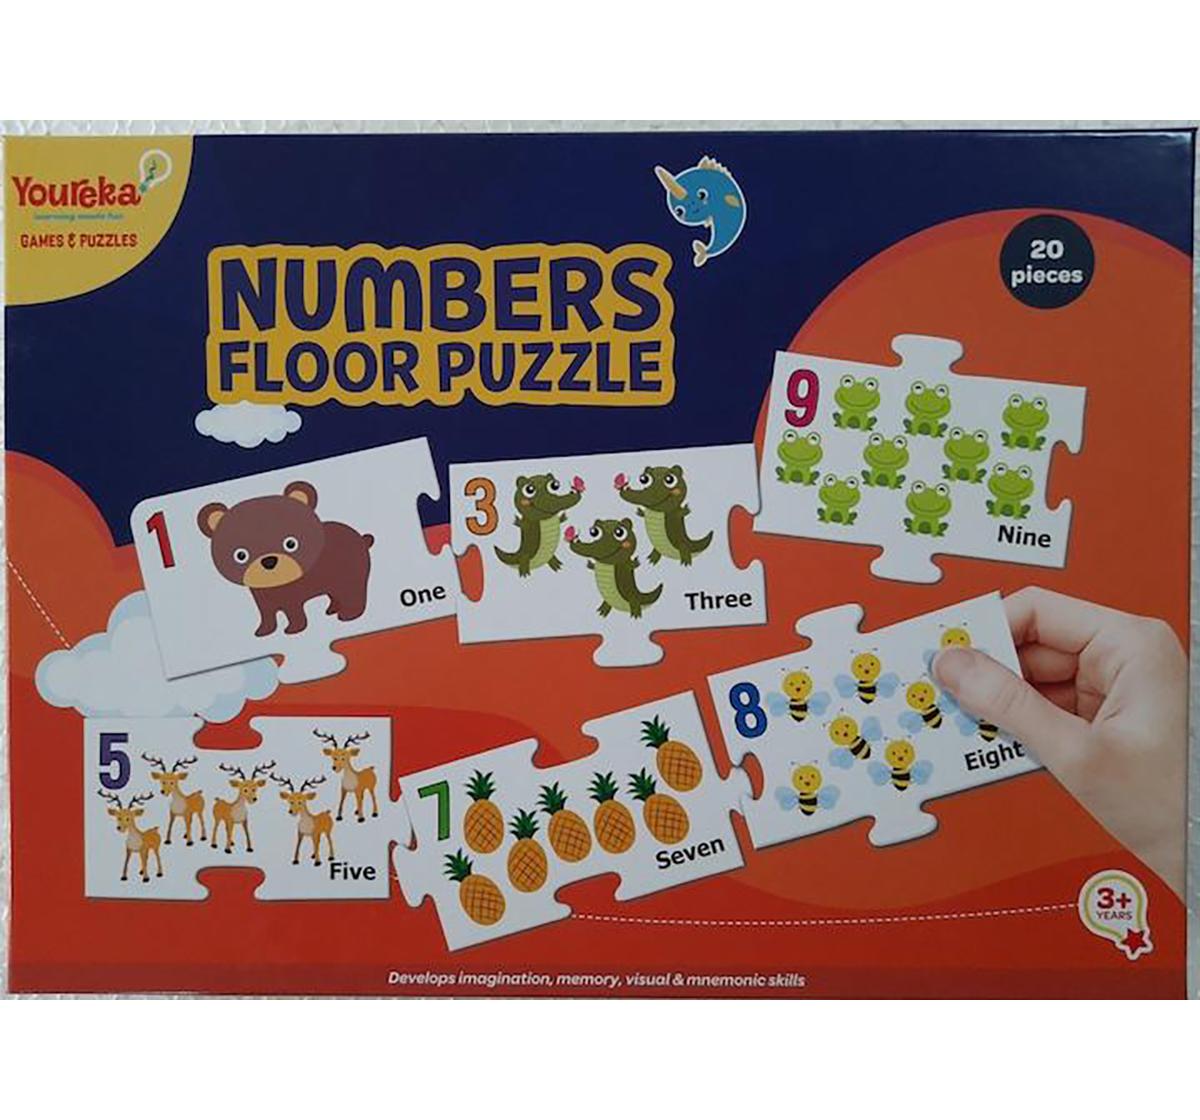 Youreka | Youreka Numbers Floor Puzzle for Kids age 3Y+